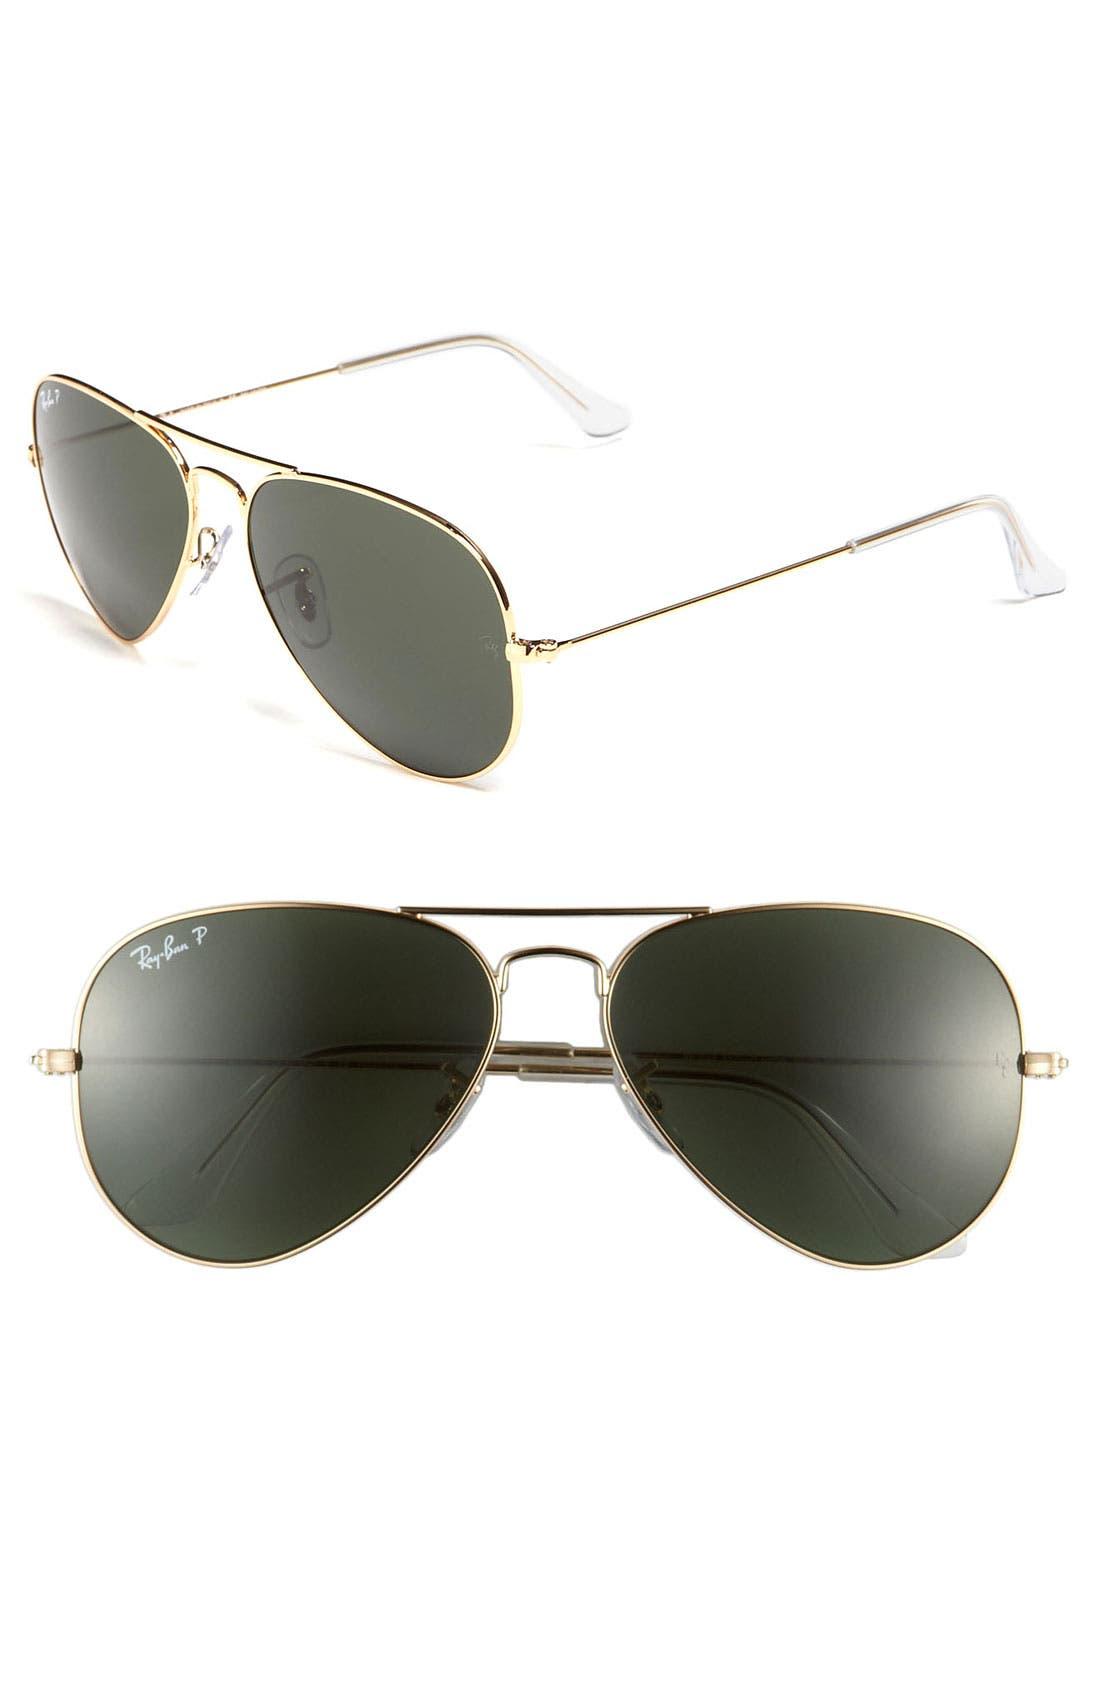 Main Image - Ray-Ban 'Polarized Original Aviator' 58mm Sunglasses